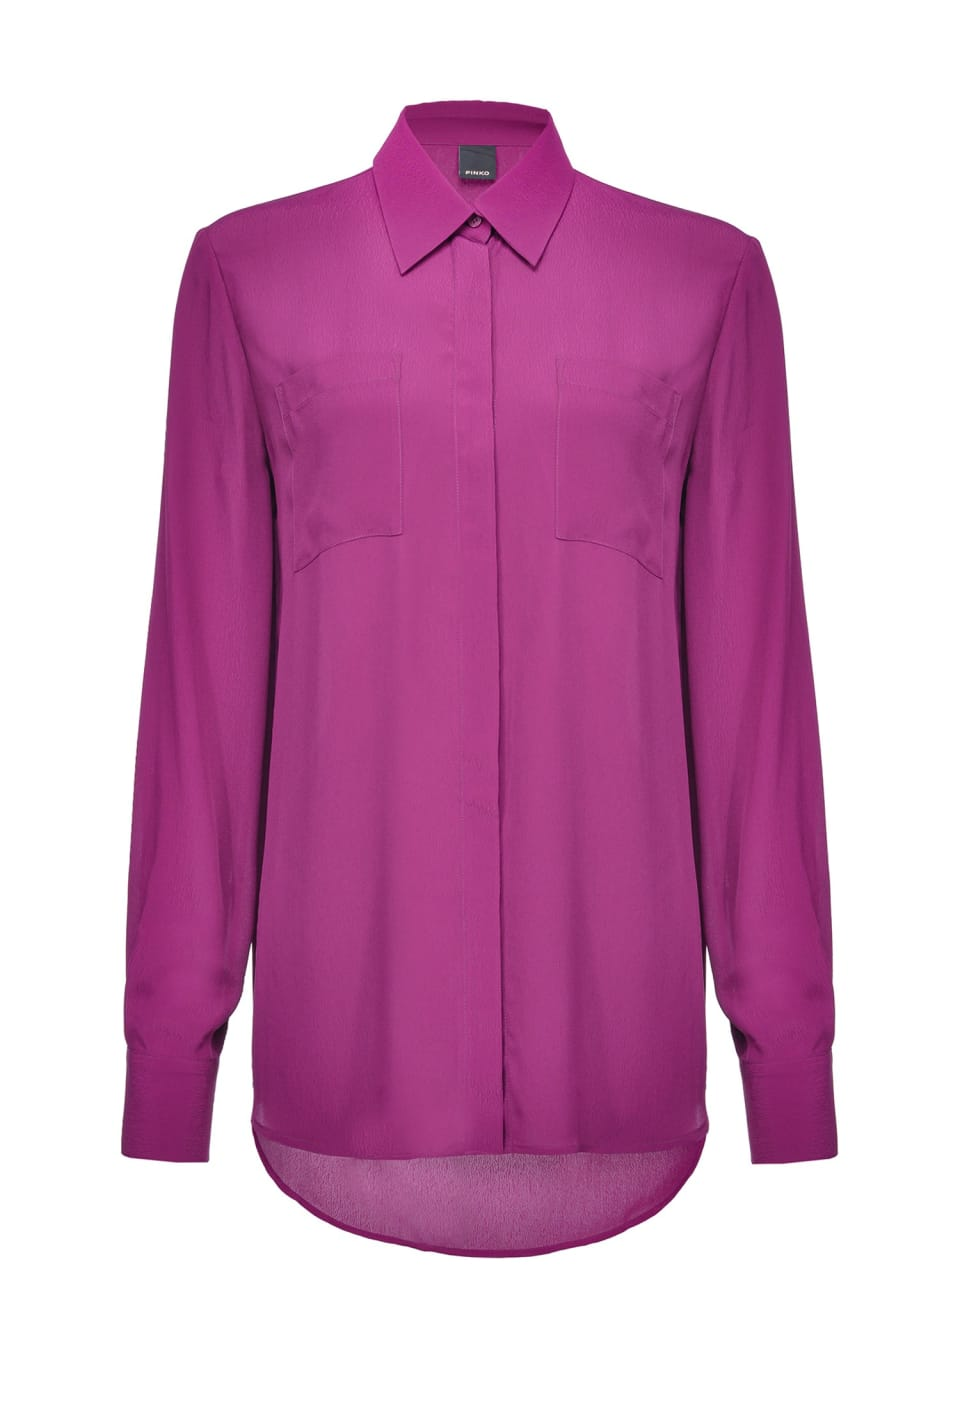 Crêpe de chine shirt - Pinko